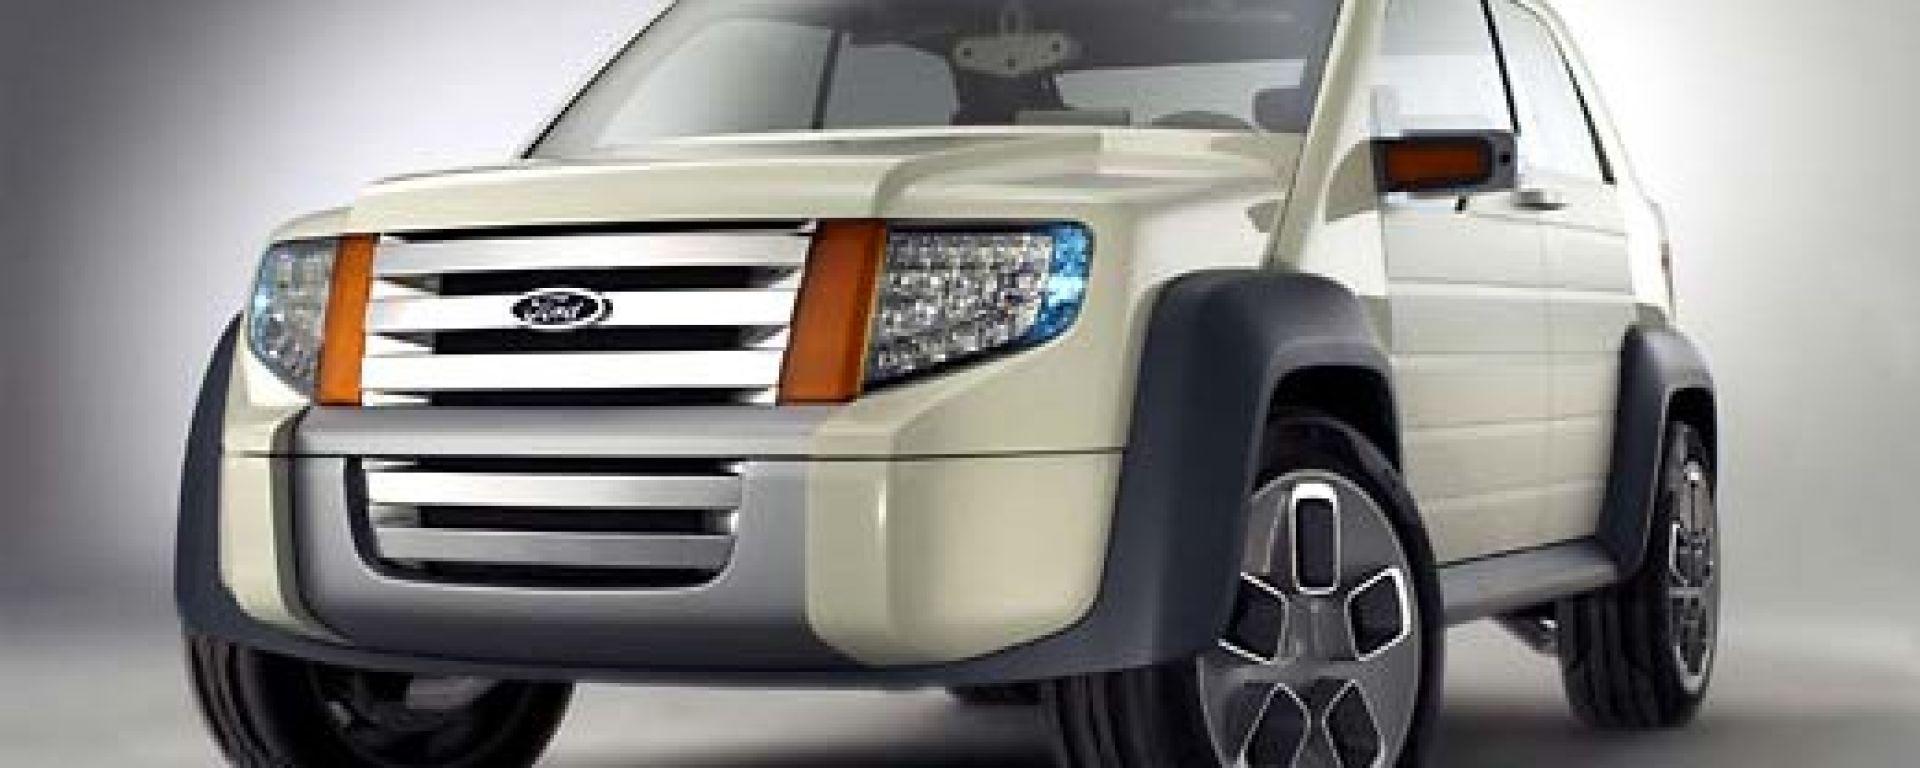 Ford U Concept